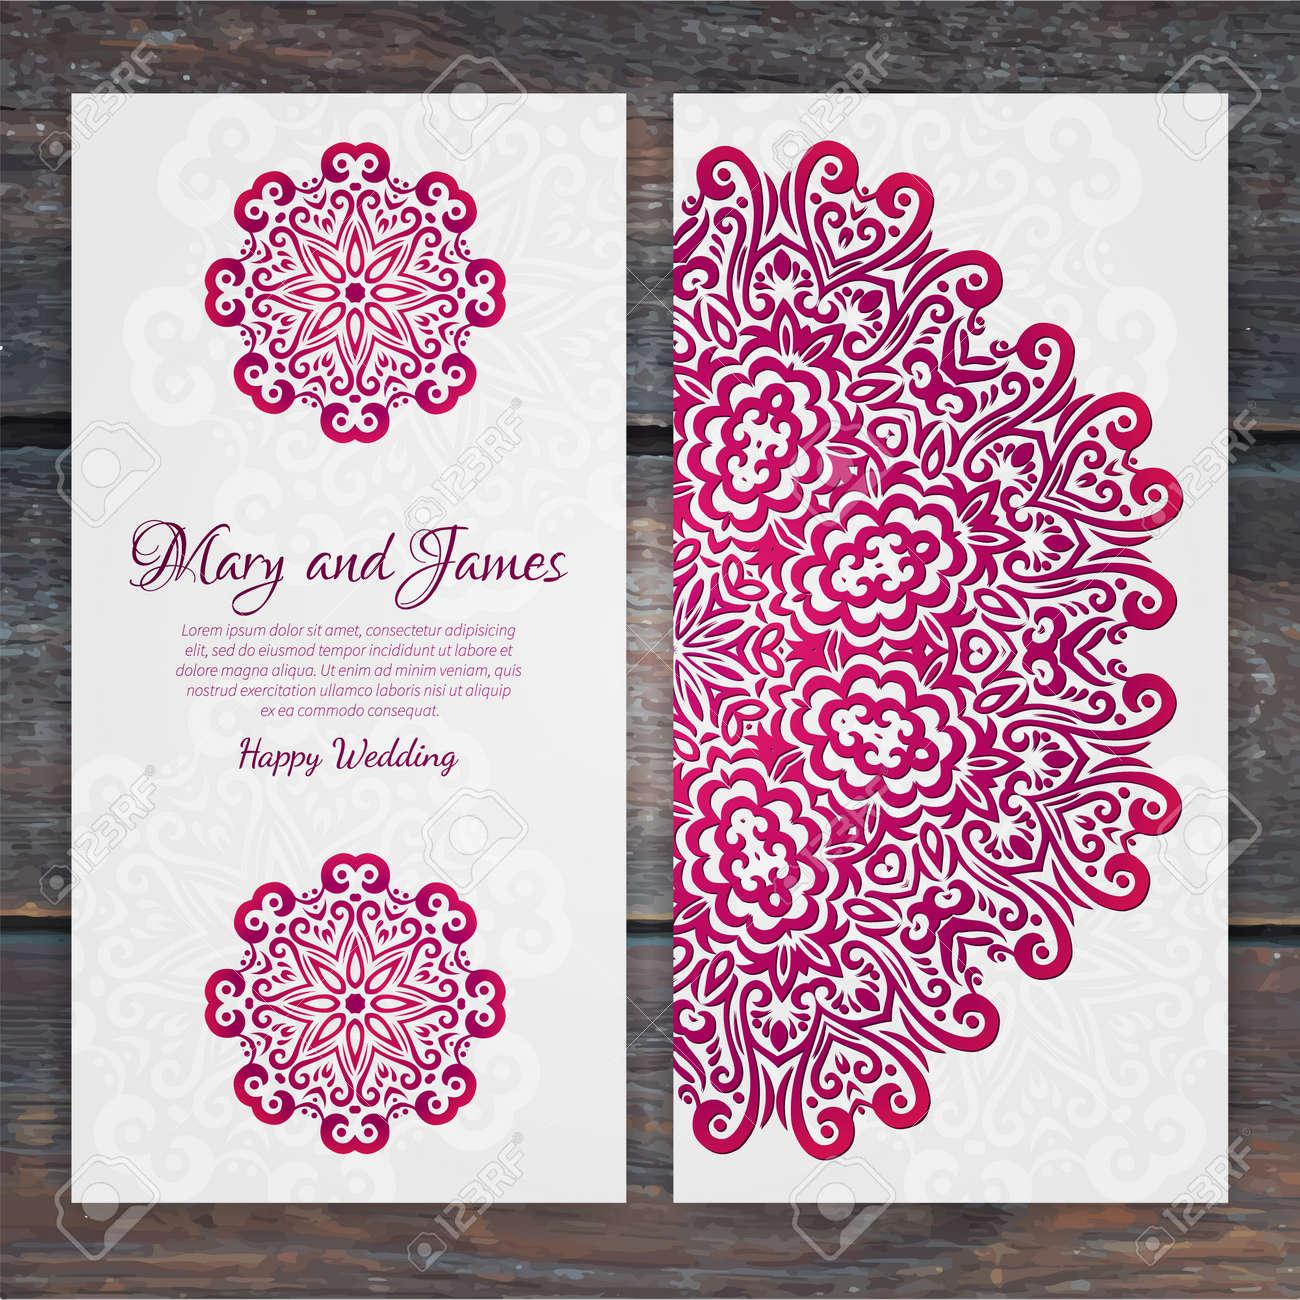 Lacy Vector Wedding Card Template Romantic Vintage Wedding